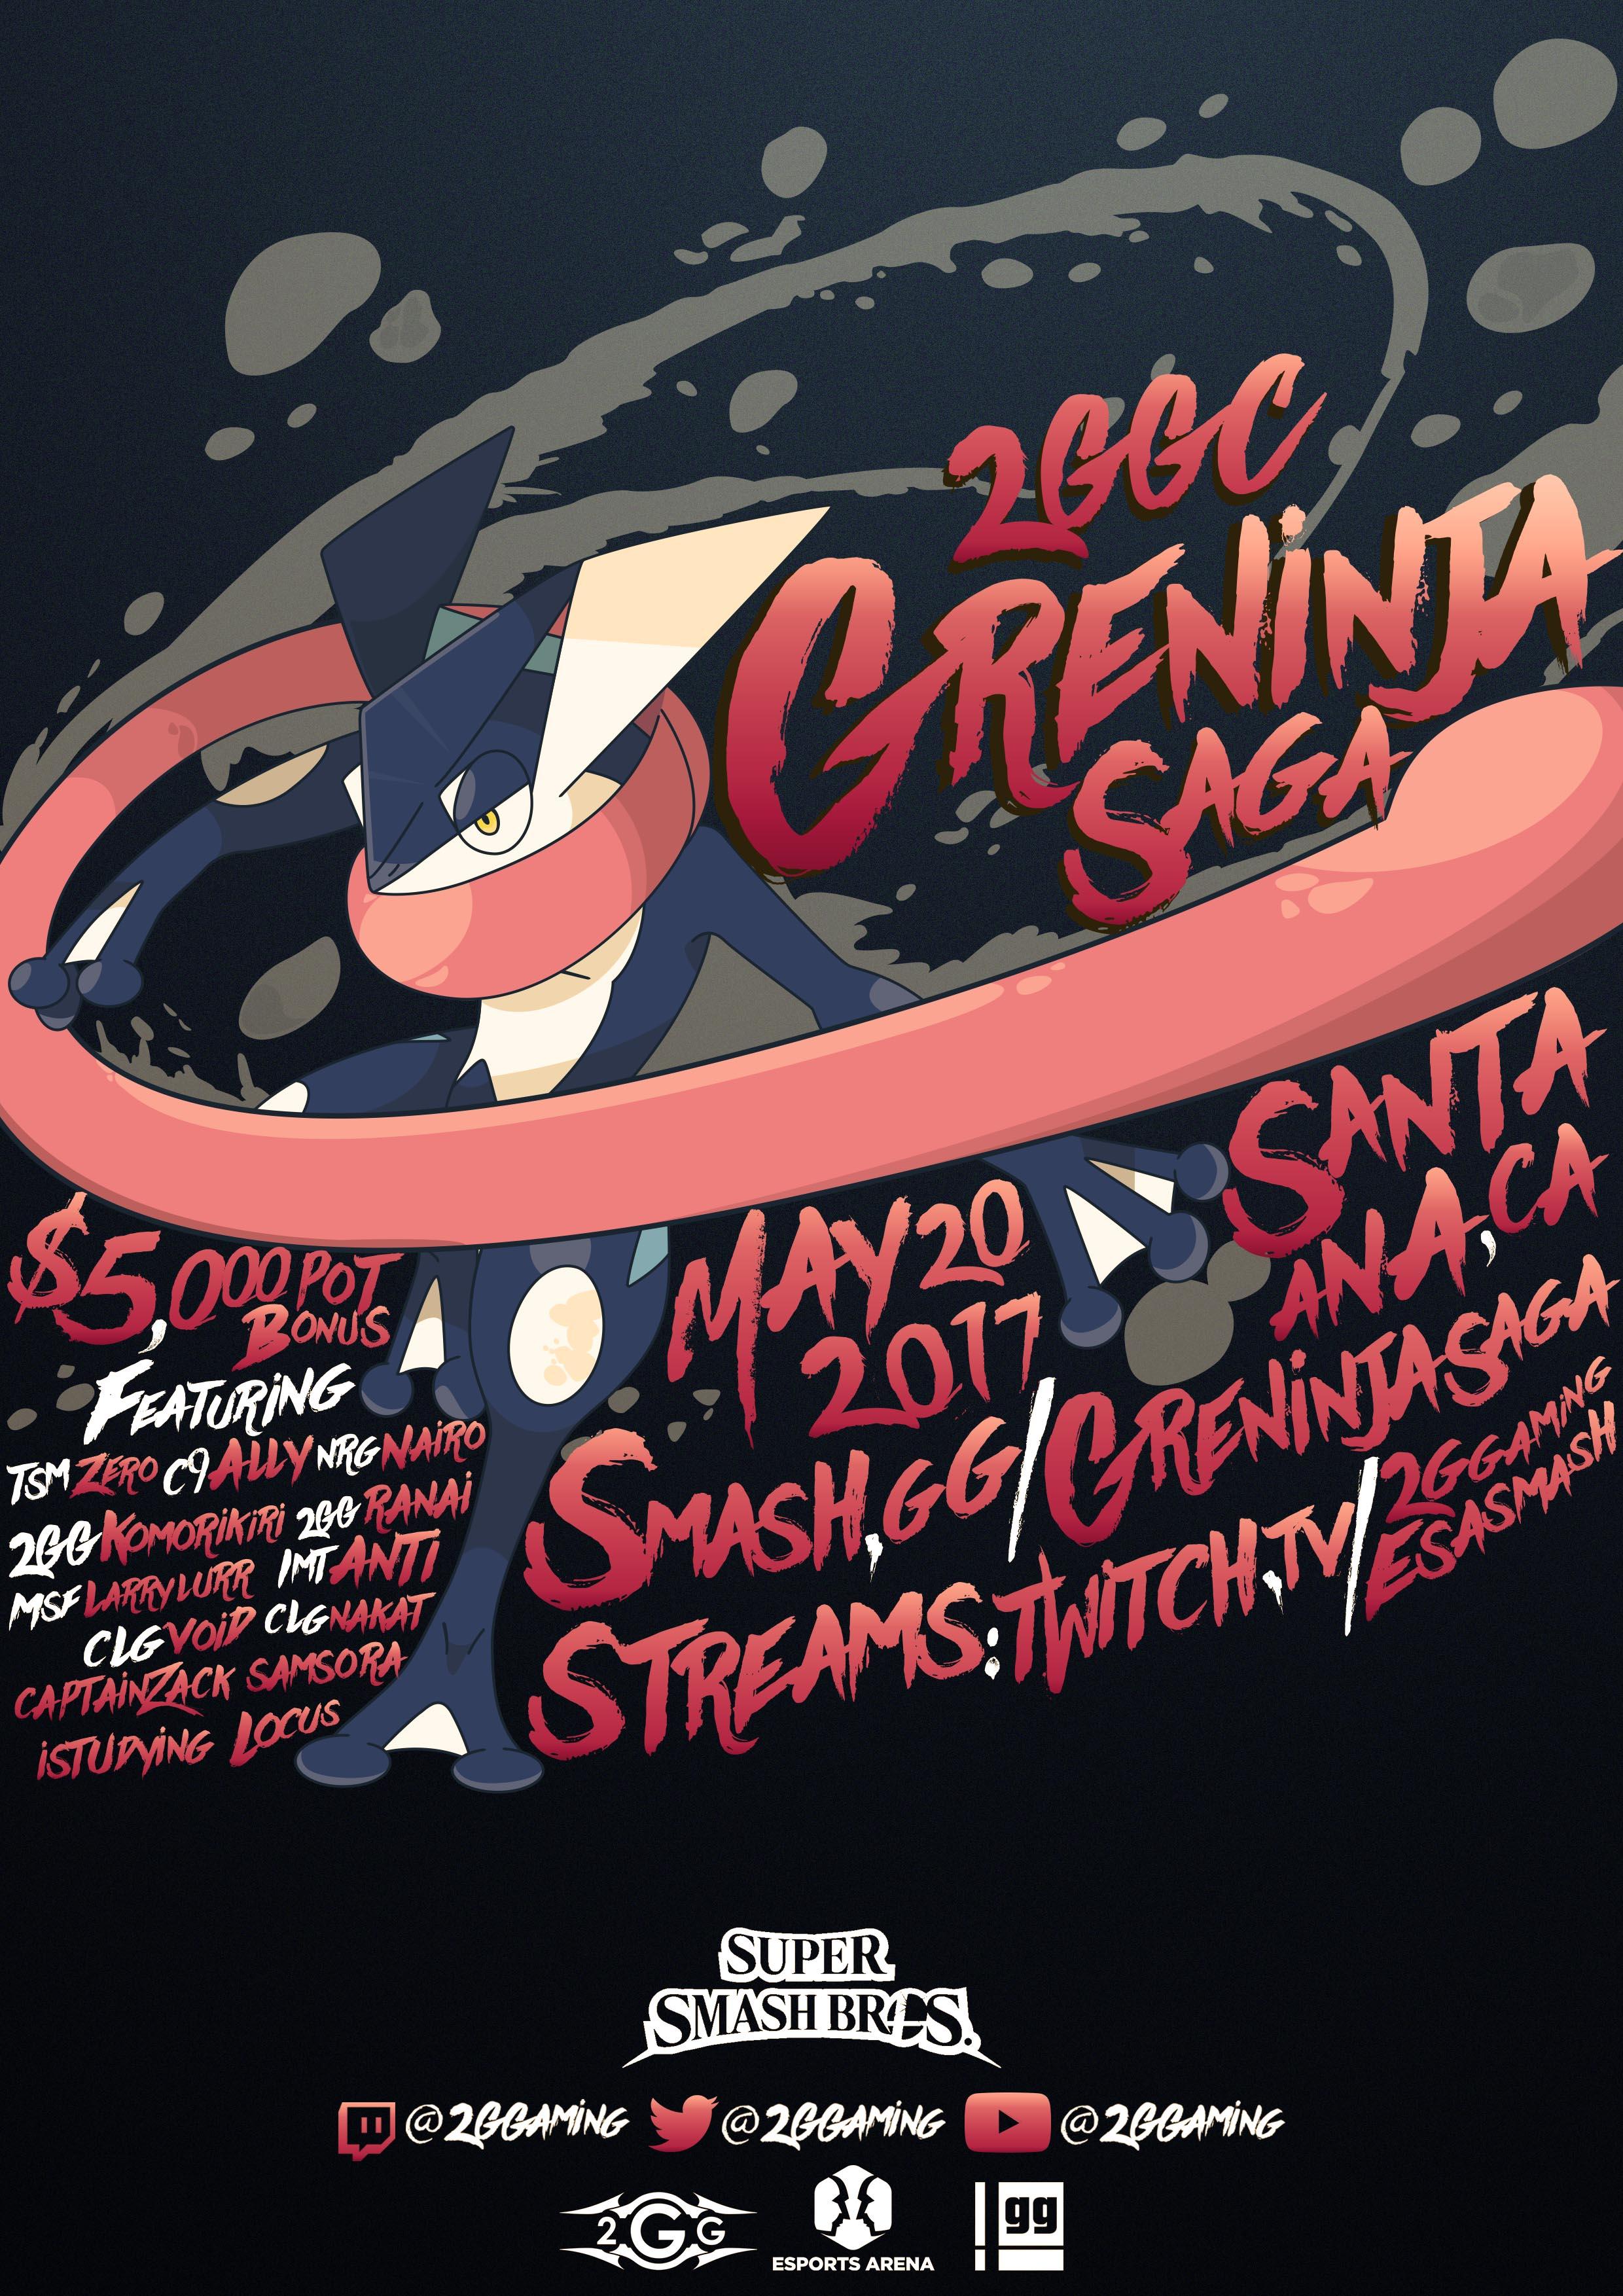 Greninja saga - poster one